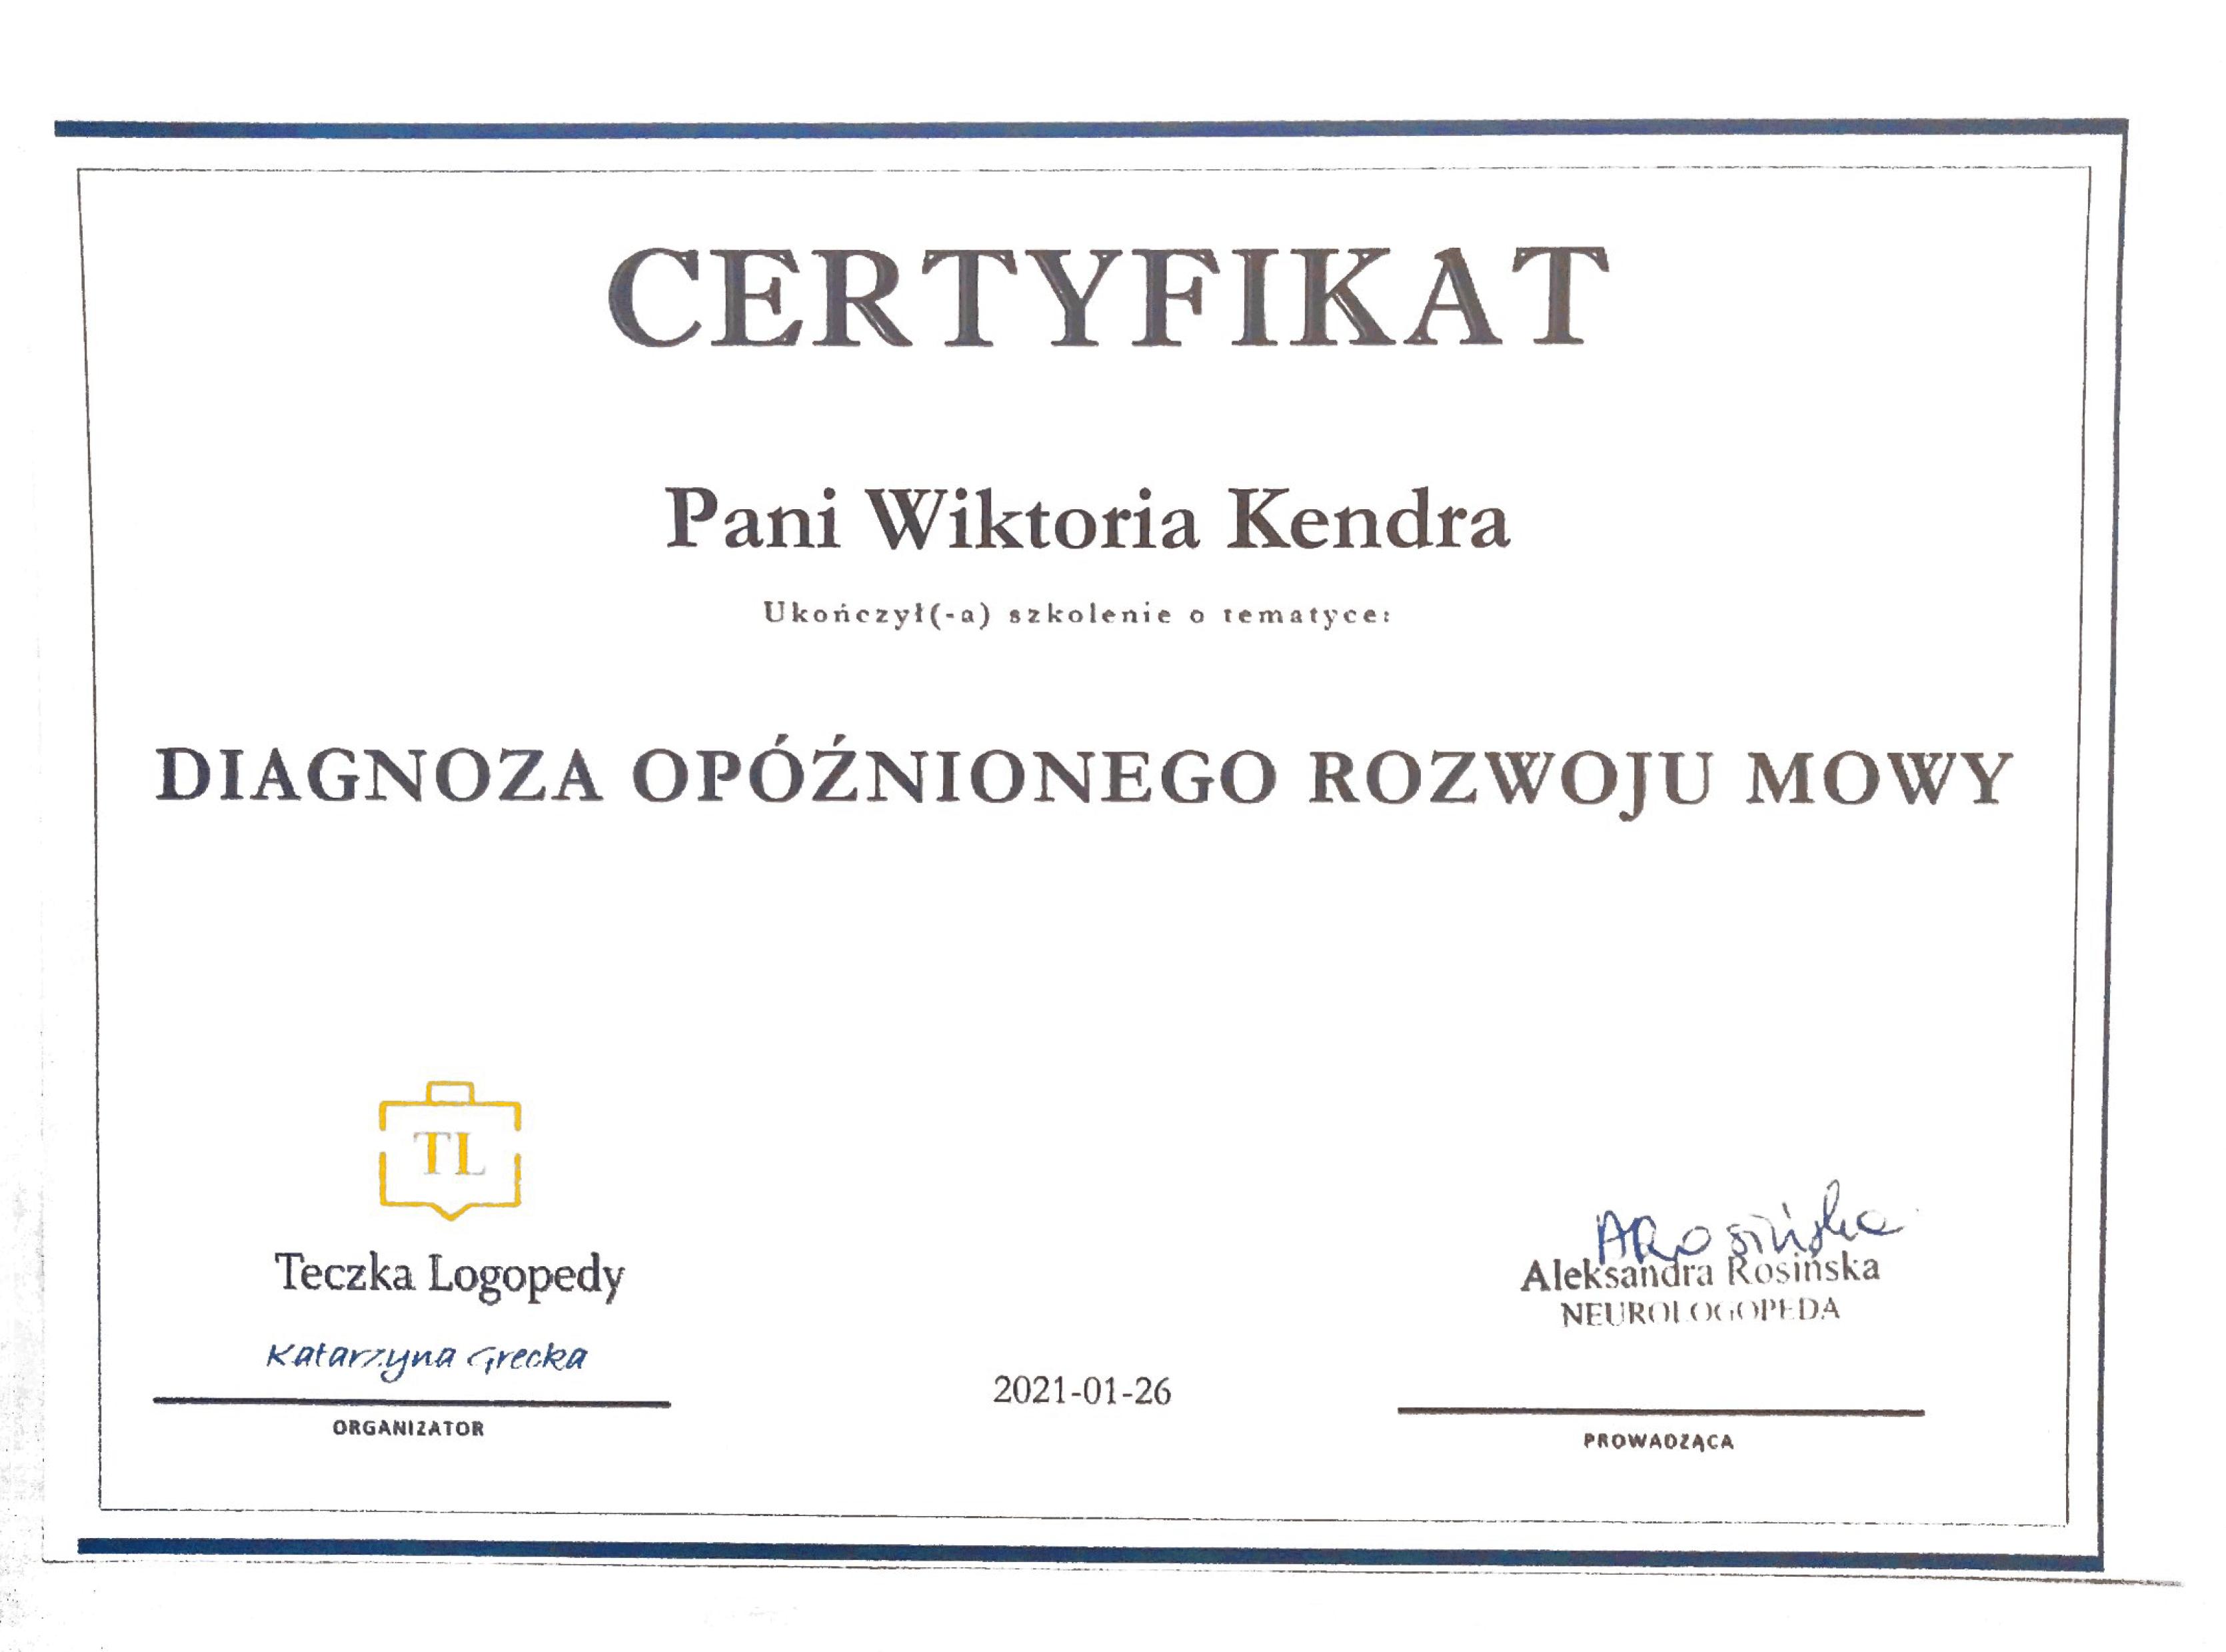 Certyfikat WK 6